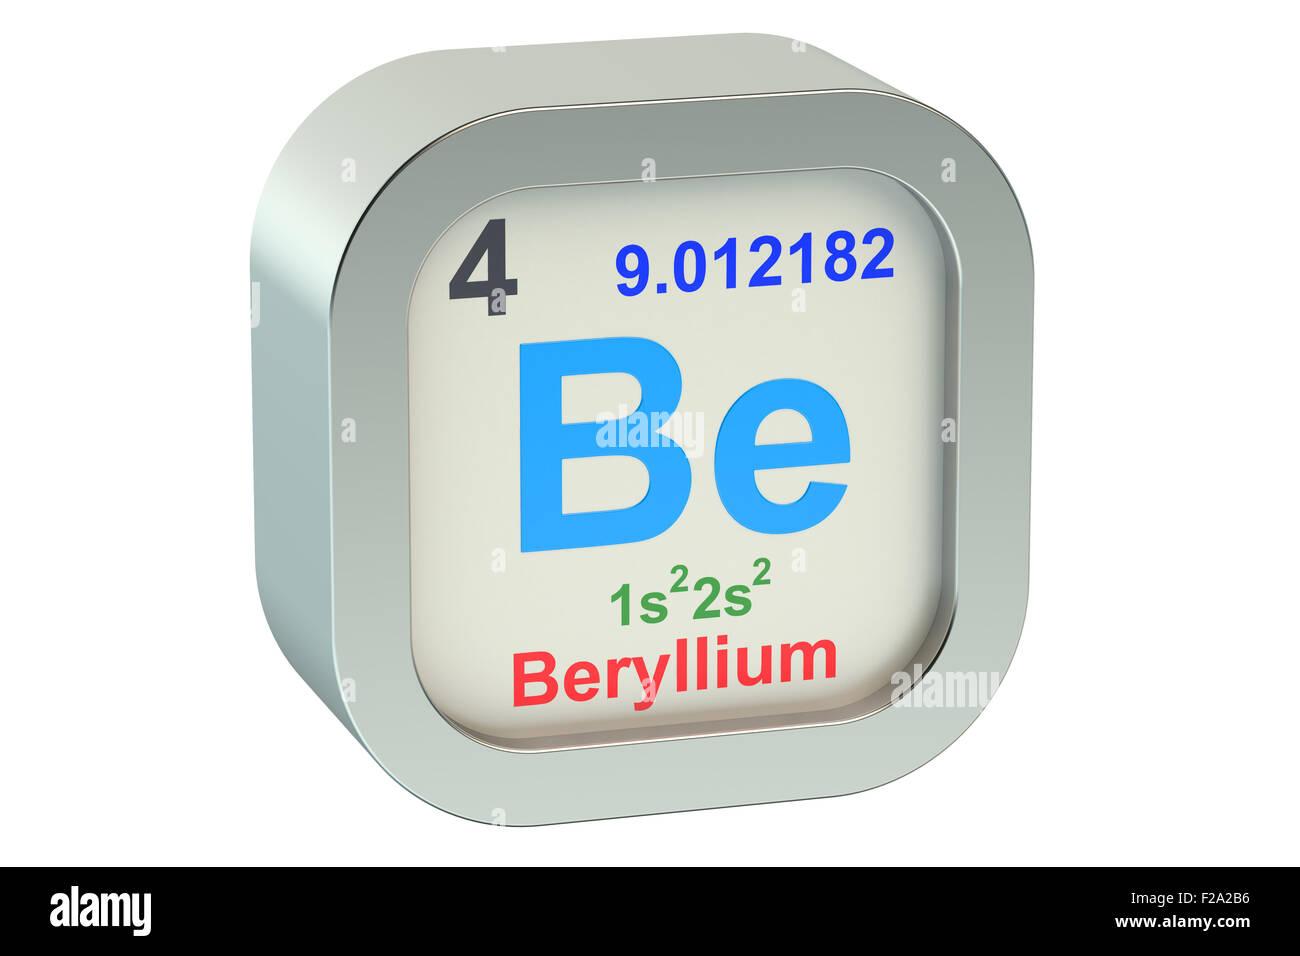 Beryllium Chemical Element Periodic Table Stock Photos Beryllium